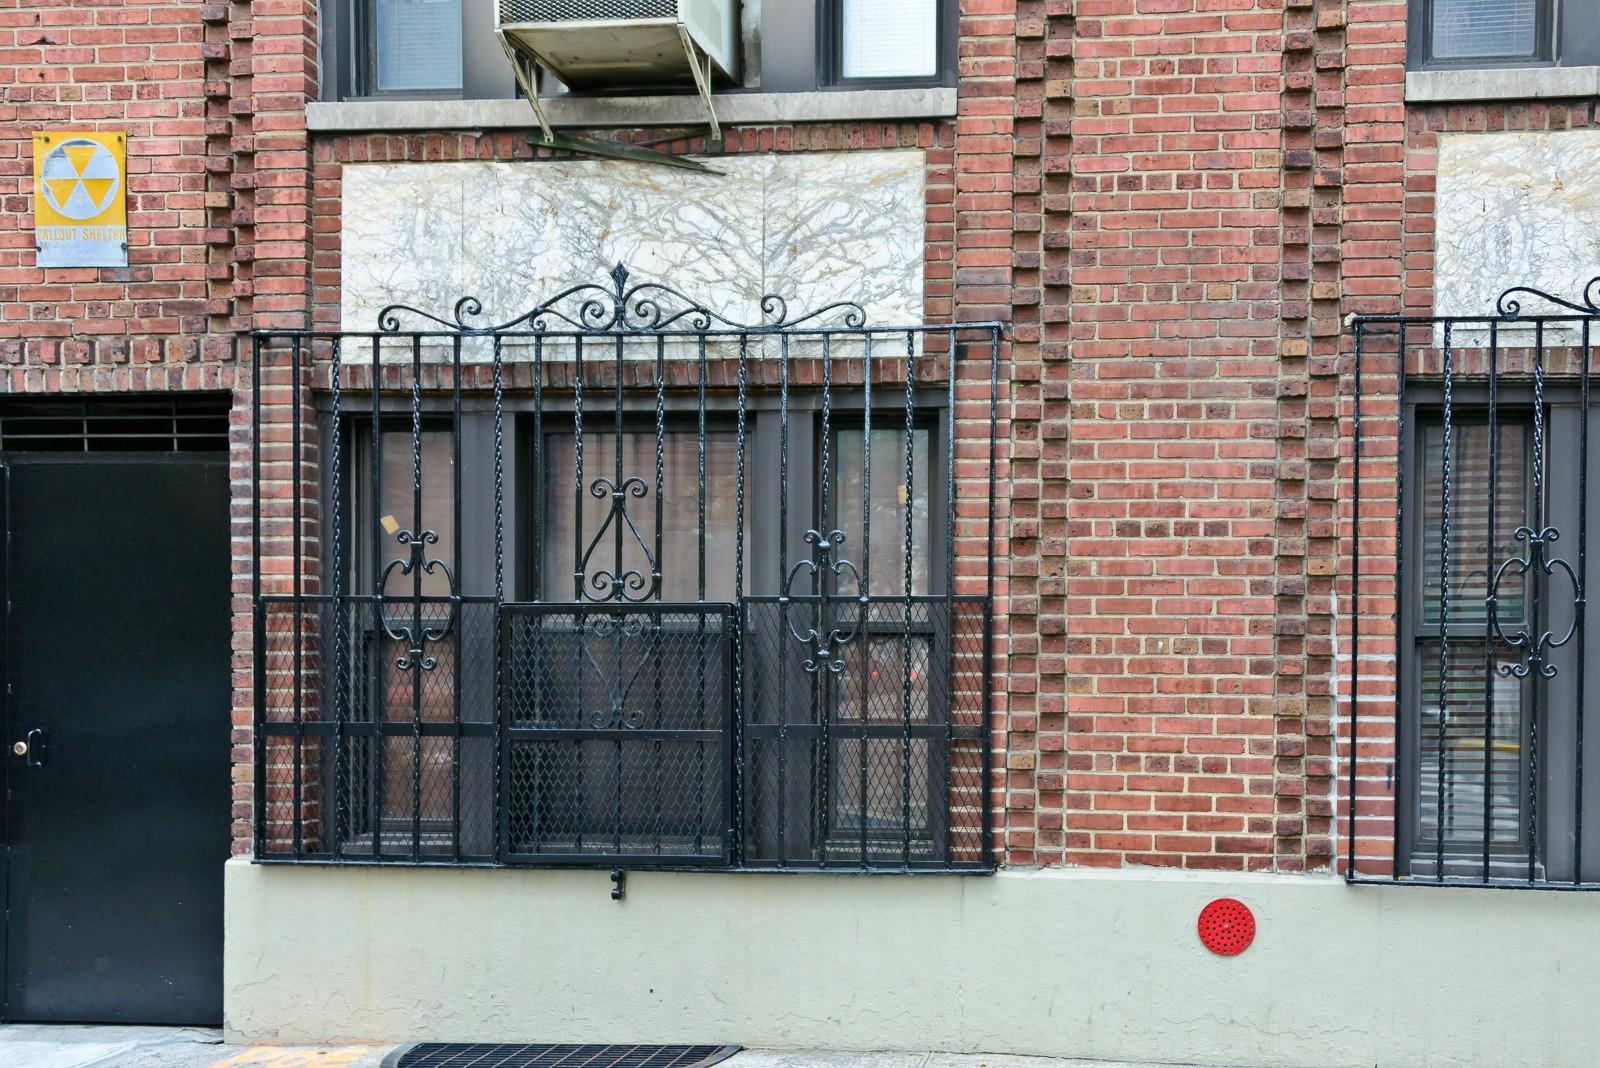 nyc-street-5513